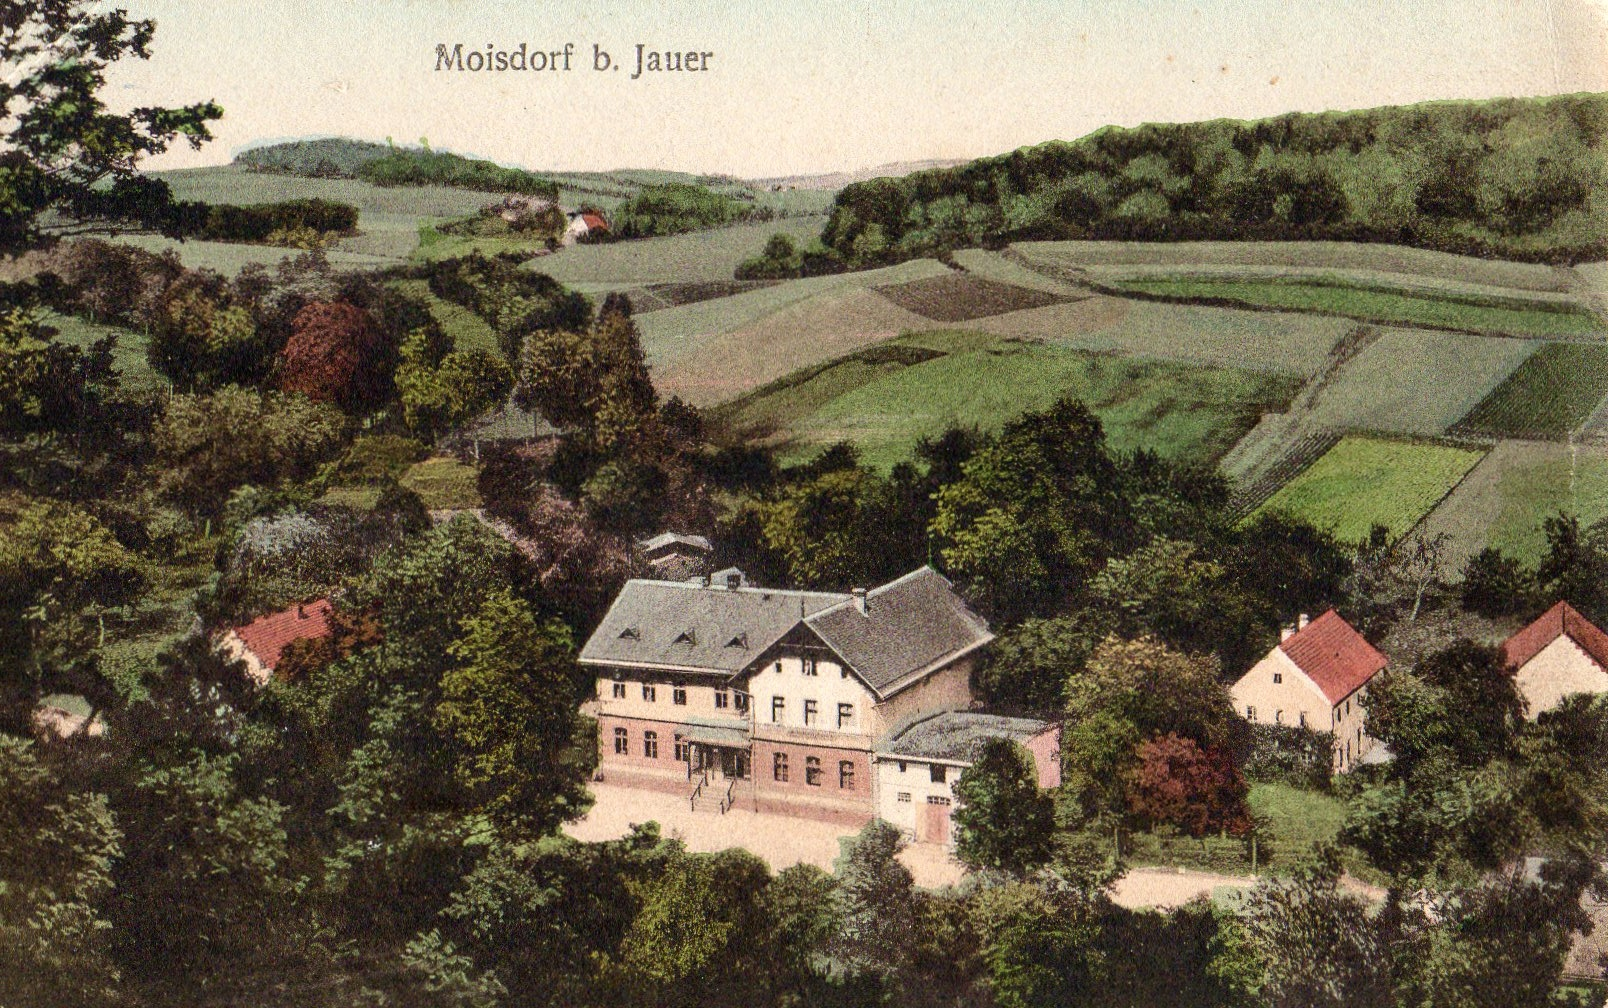 MOISDORF B.JAUER MYŚLIBÓRZ JAWOR